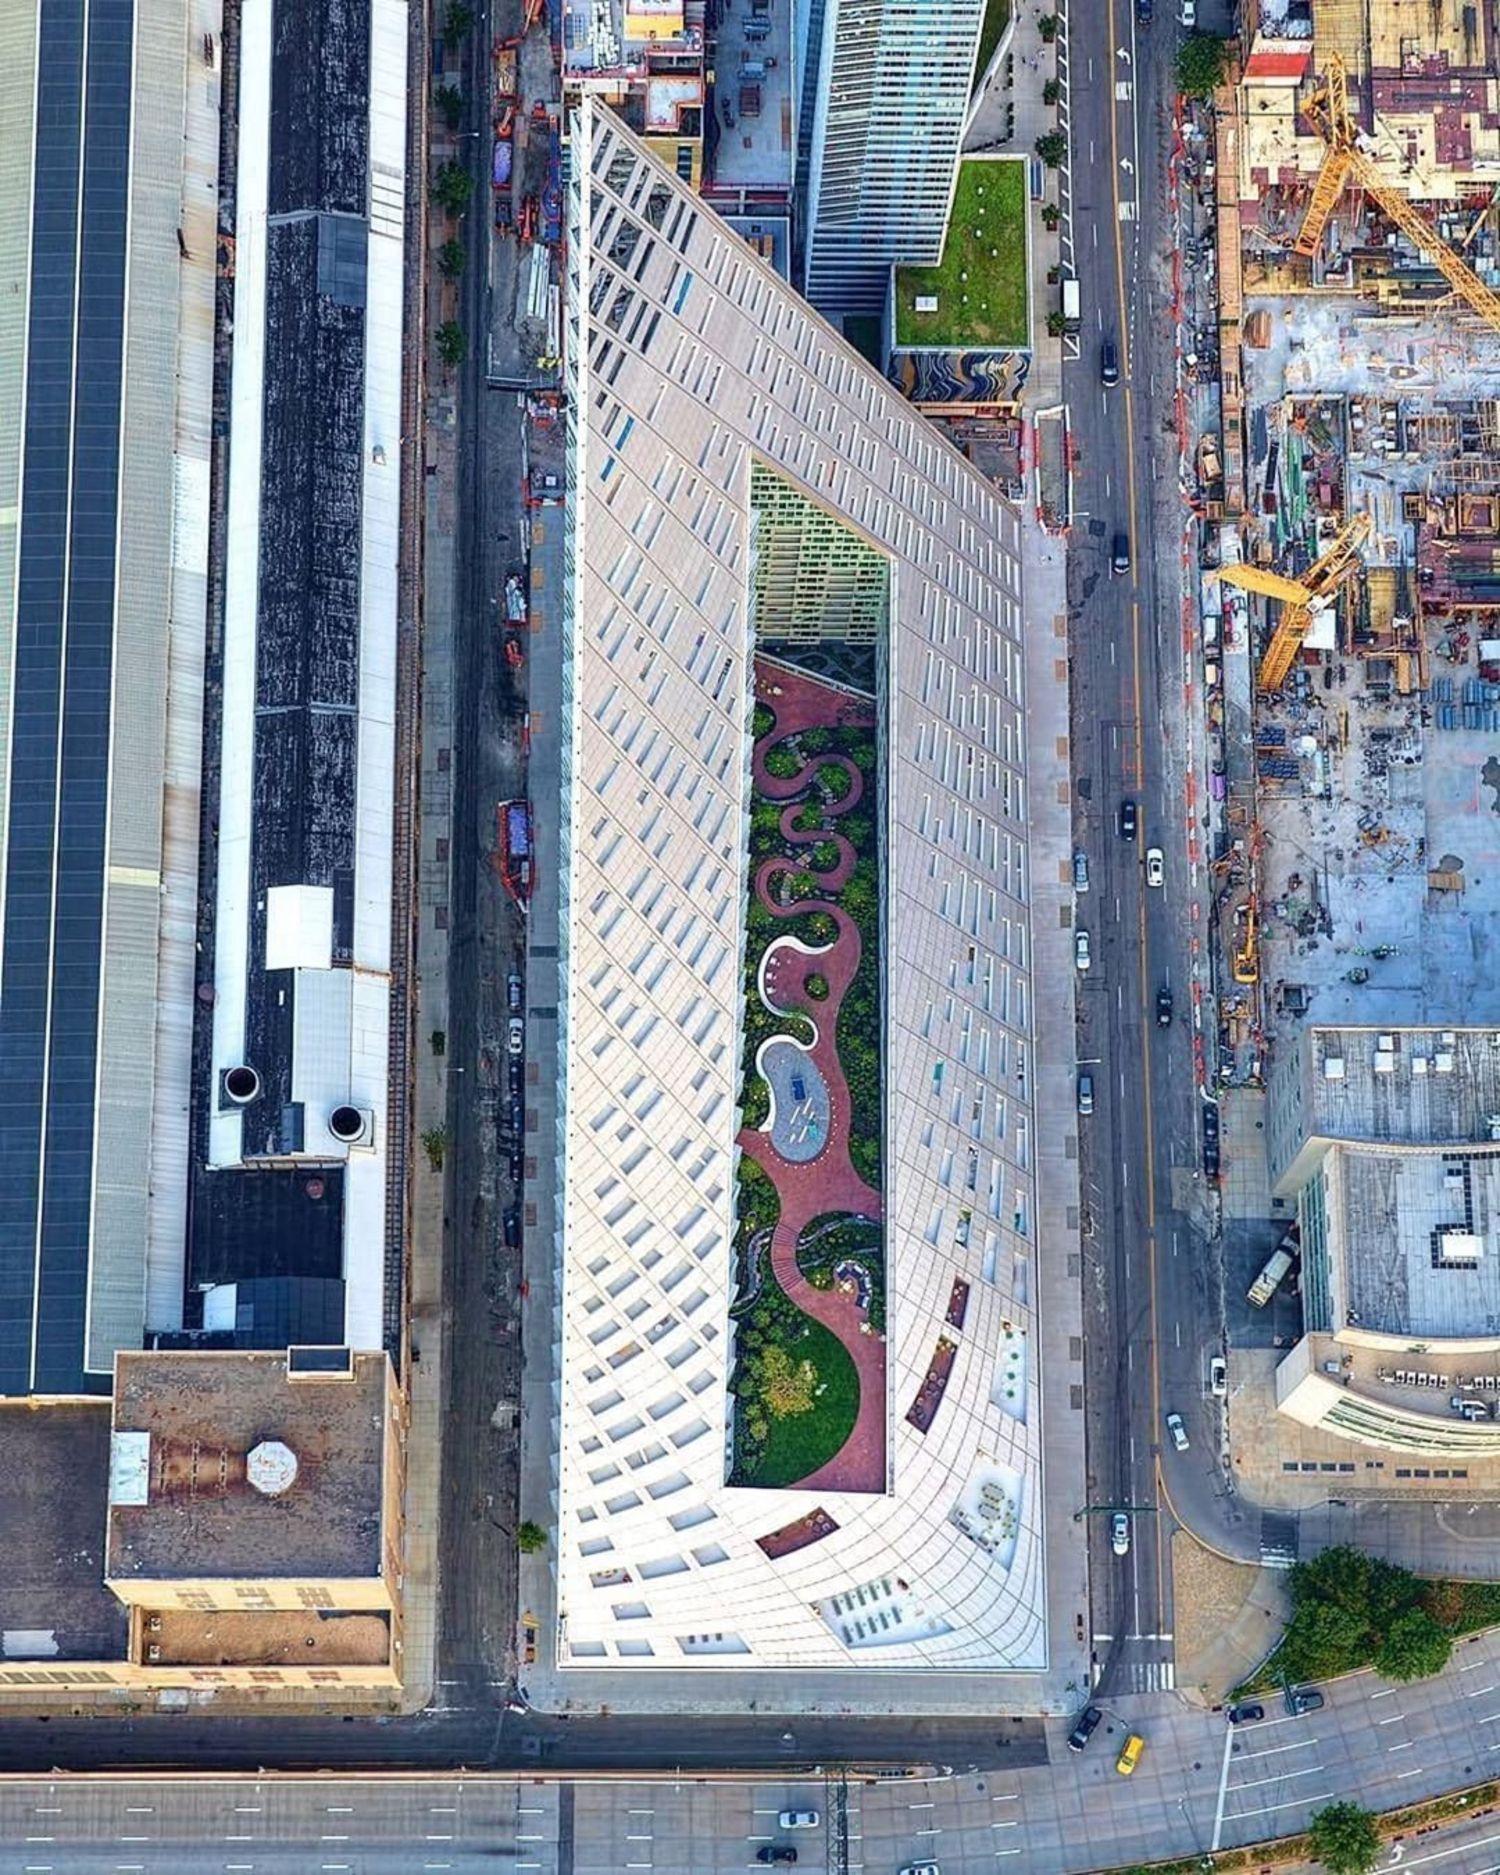 VIA 57, Manhattan. Photo via @mattpugs #viewingnyc #nyc #newyork #newyorkcity  #via57west